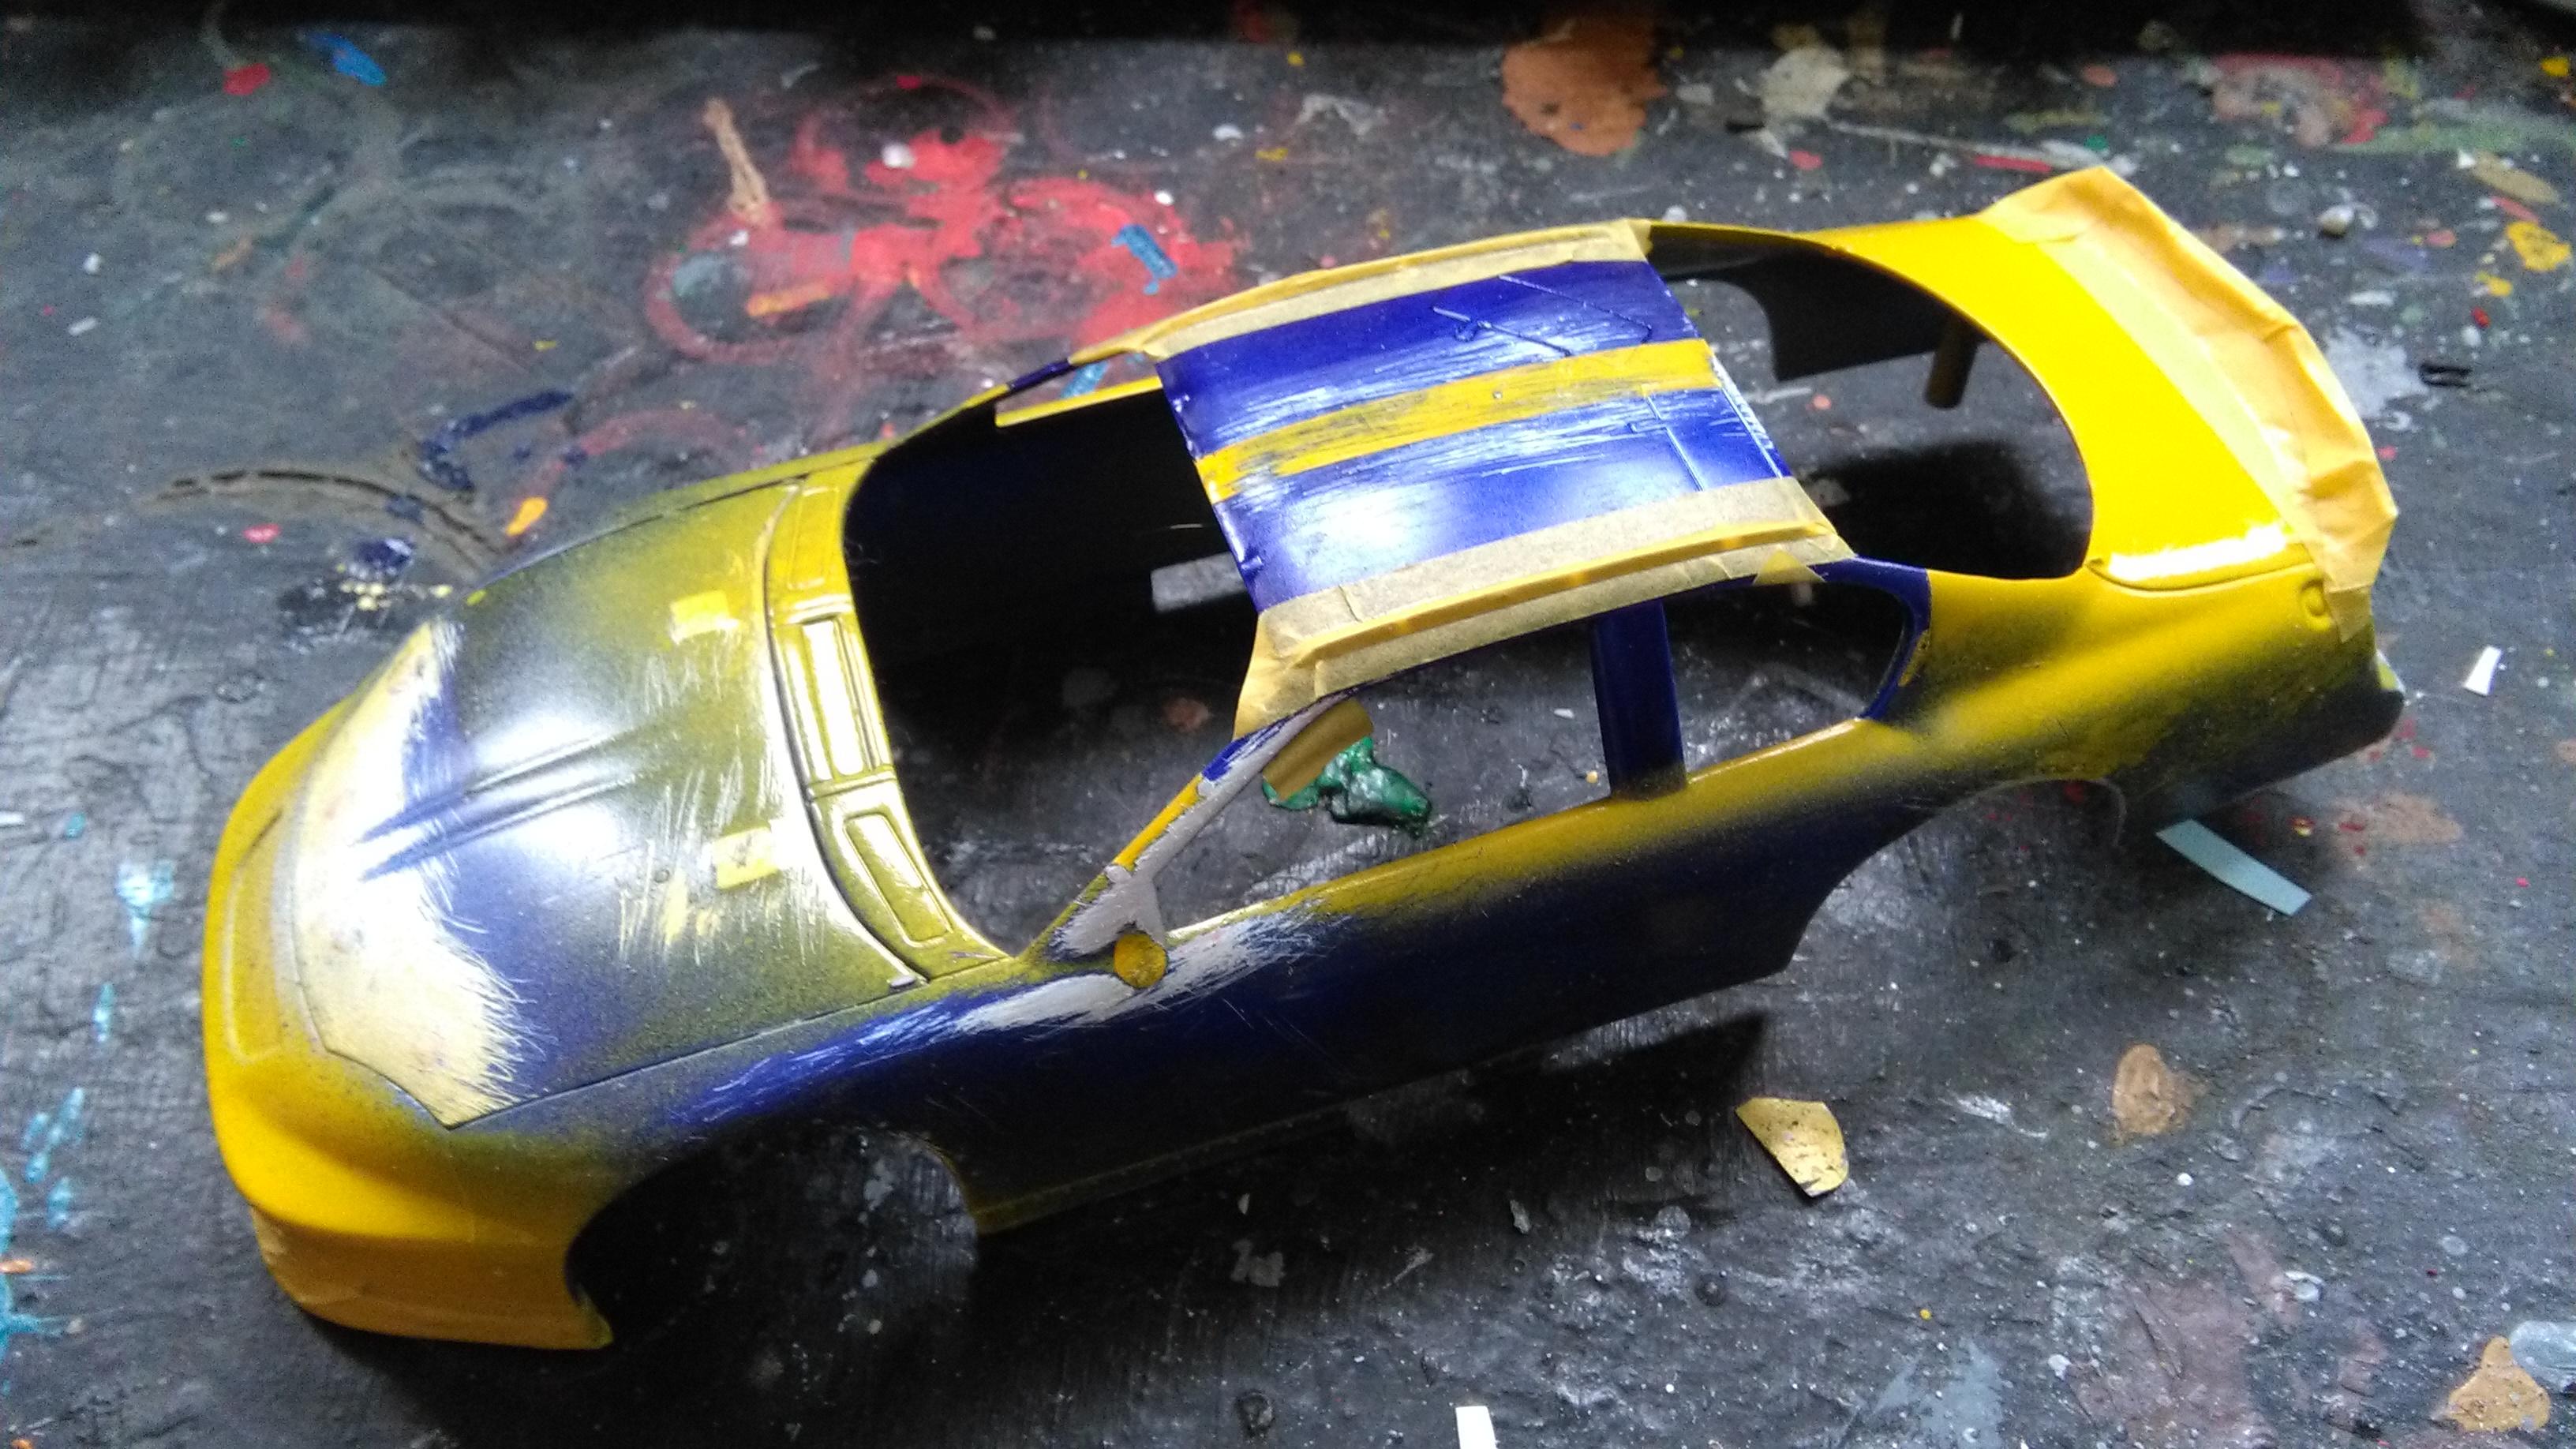 Chevy Monte-Carlo 2005 #24 Jeff Gordon Pepsi/Star Wars  490490IMG20170426175651